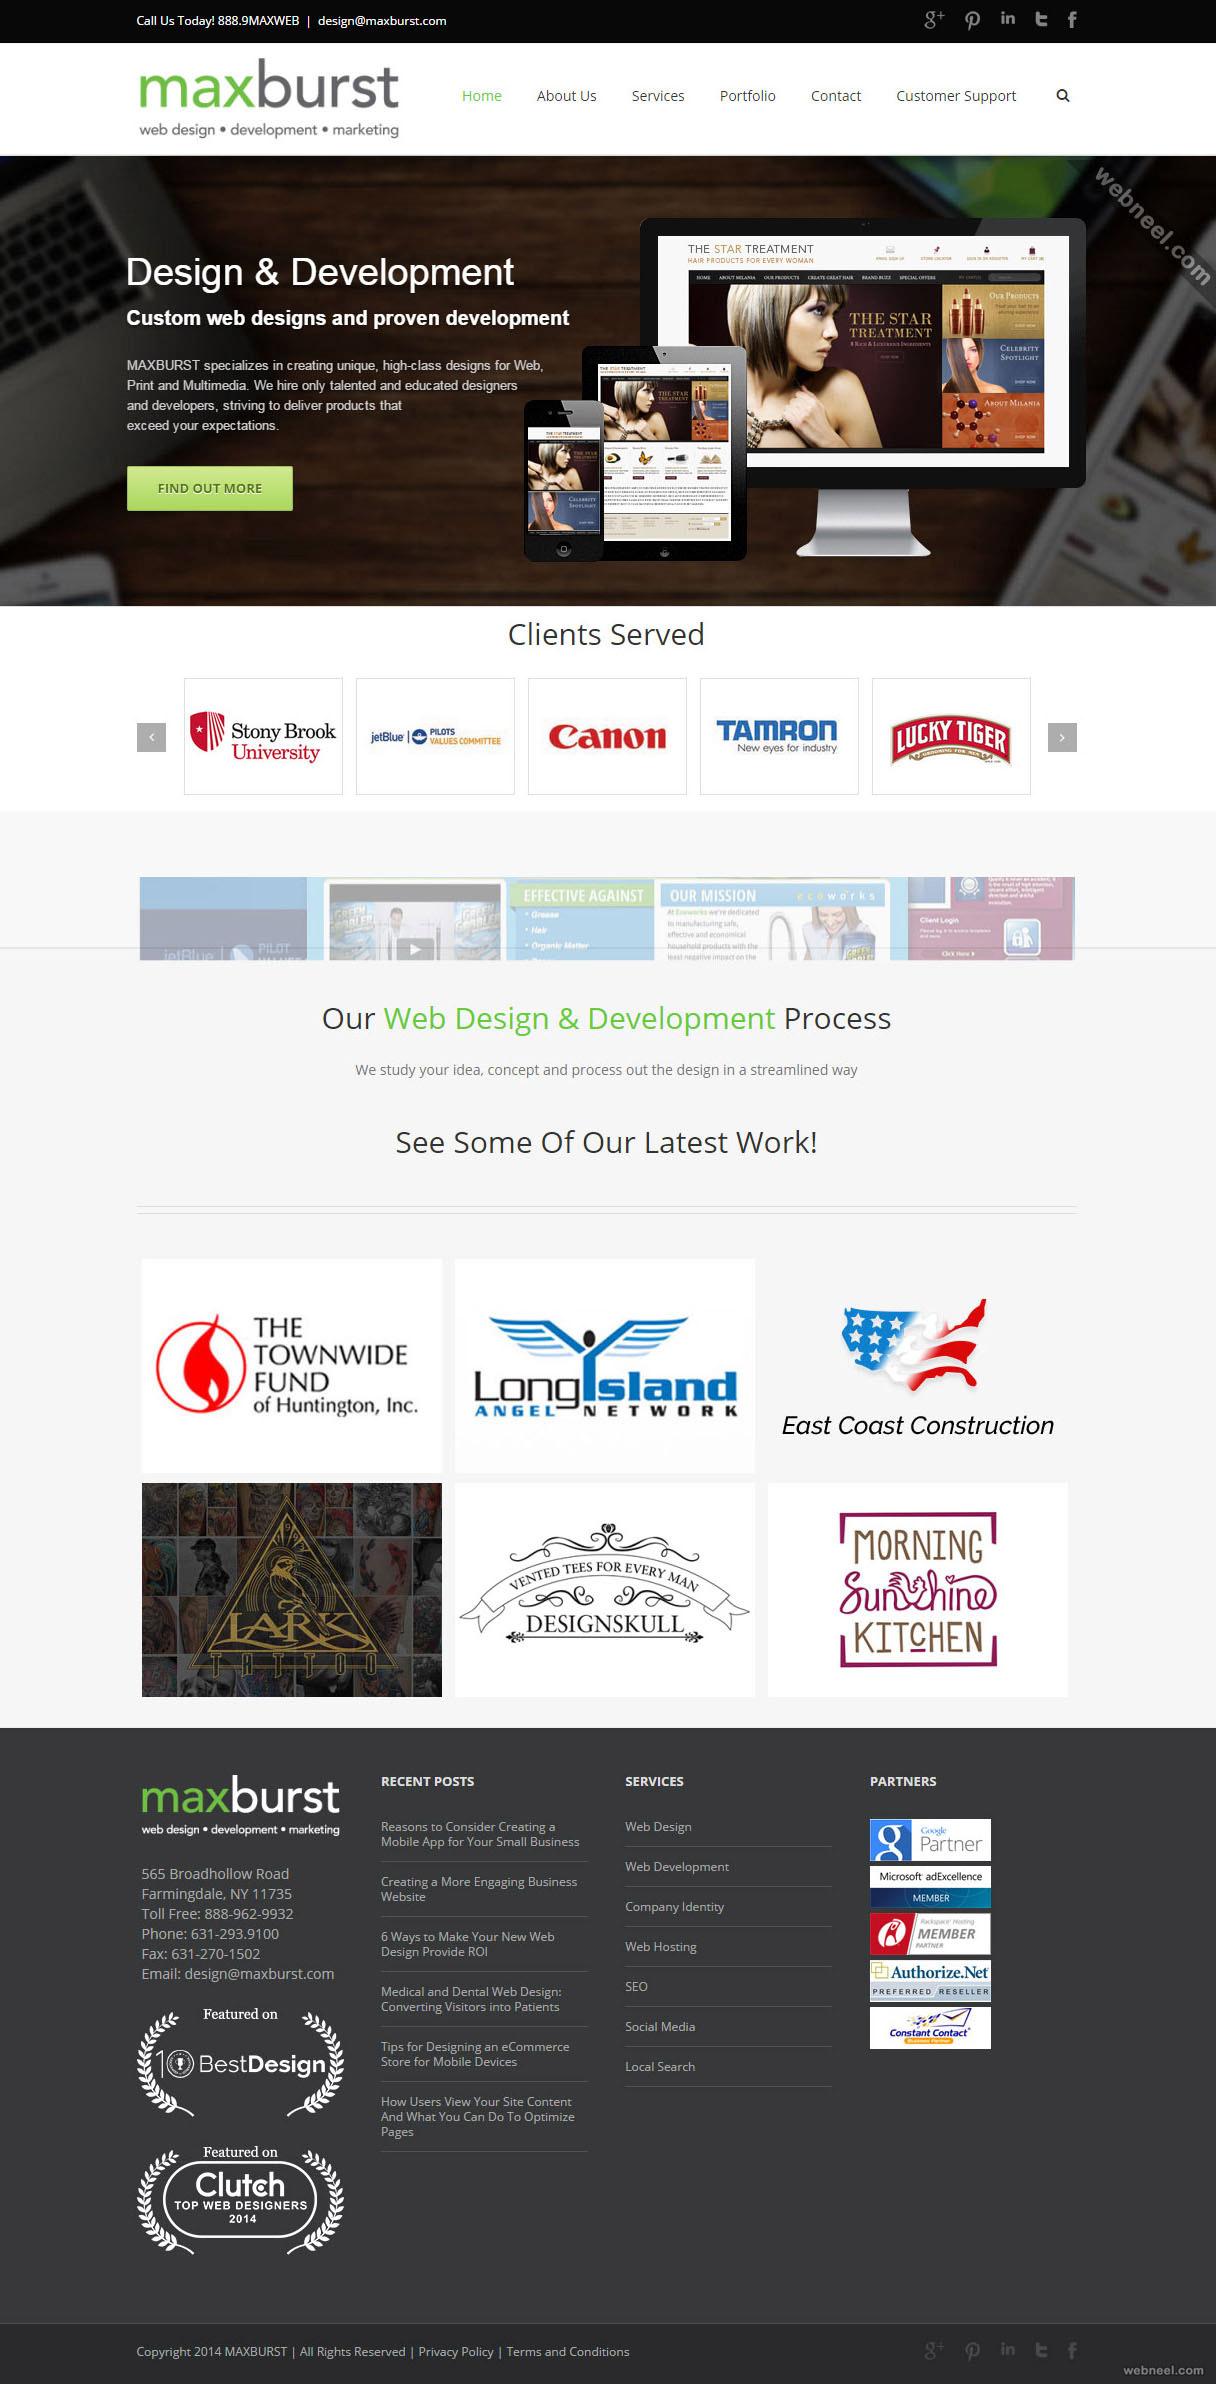 top design company maxburst longisland